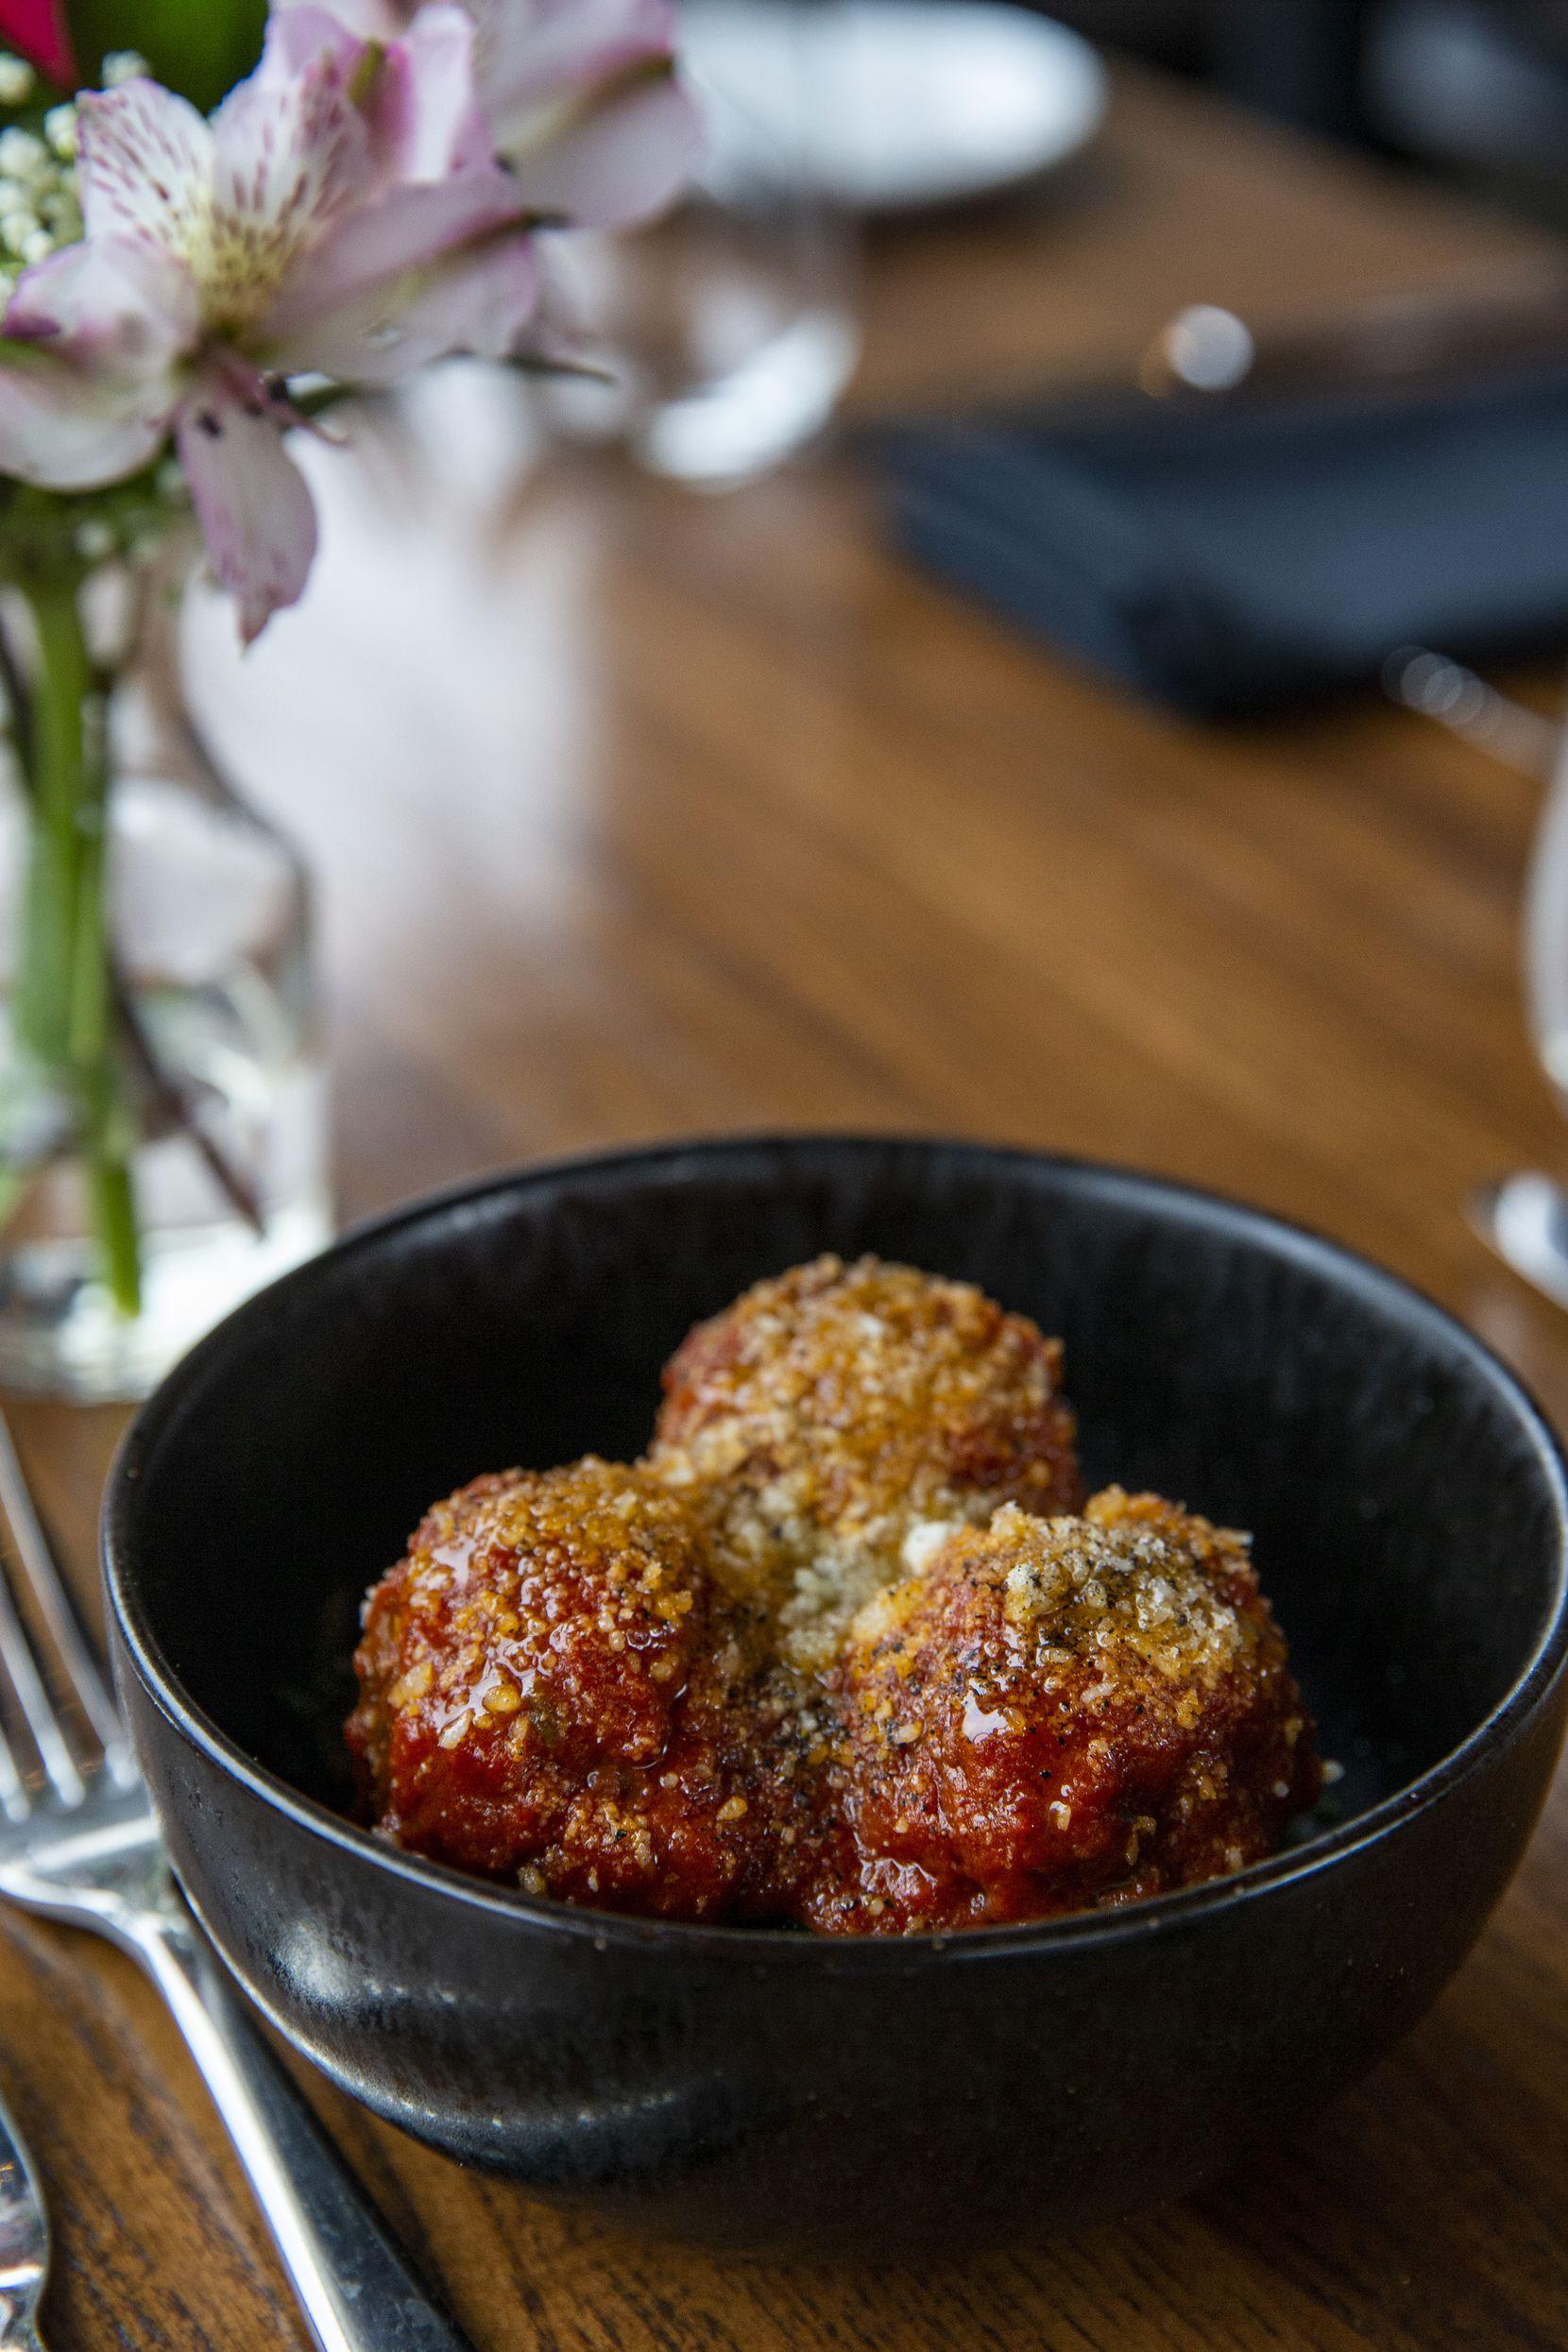 The lamb meatballs at Mille Lire restaurant in Dallas